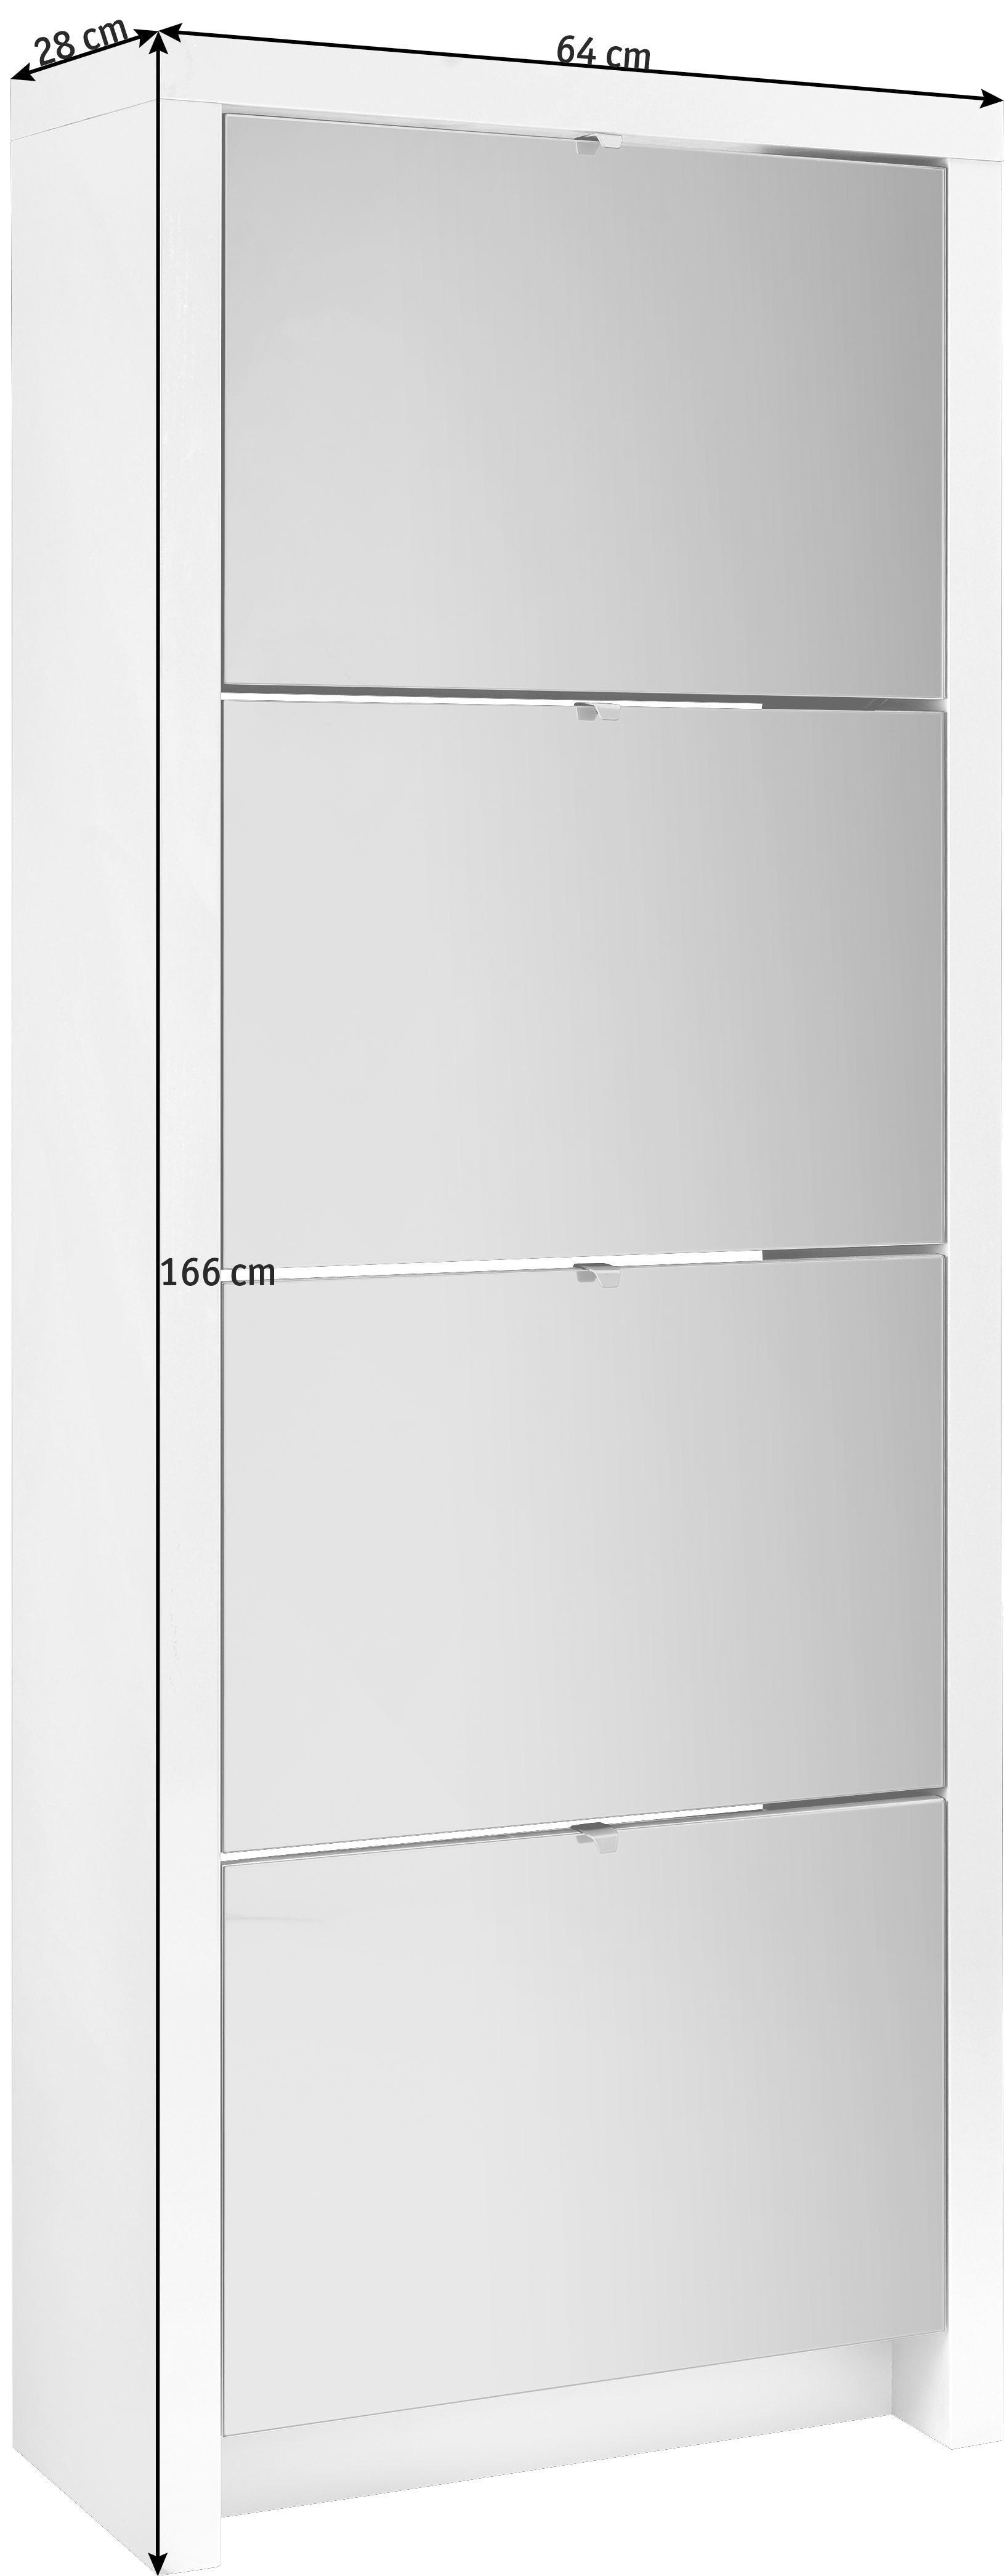 ORMARIĆ ZA OBUĆU - bijela/boje aluminija, Design, staklo/drvni materijal (64/166/28cm) - XORA